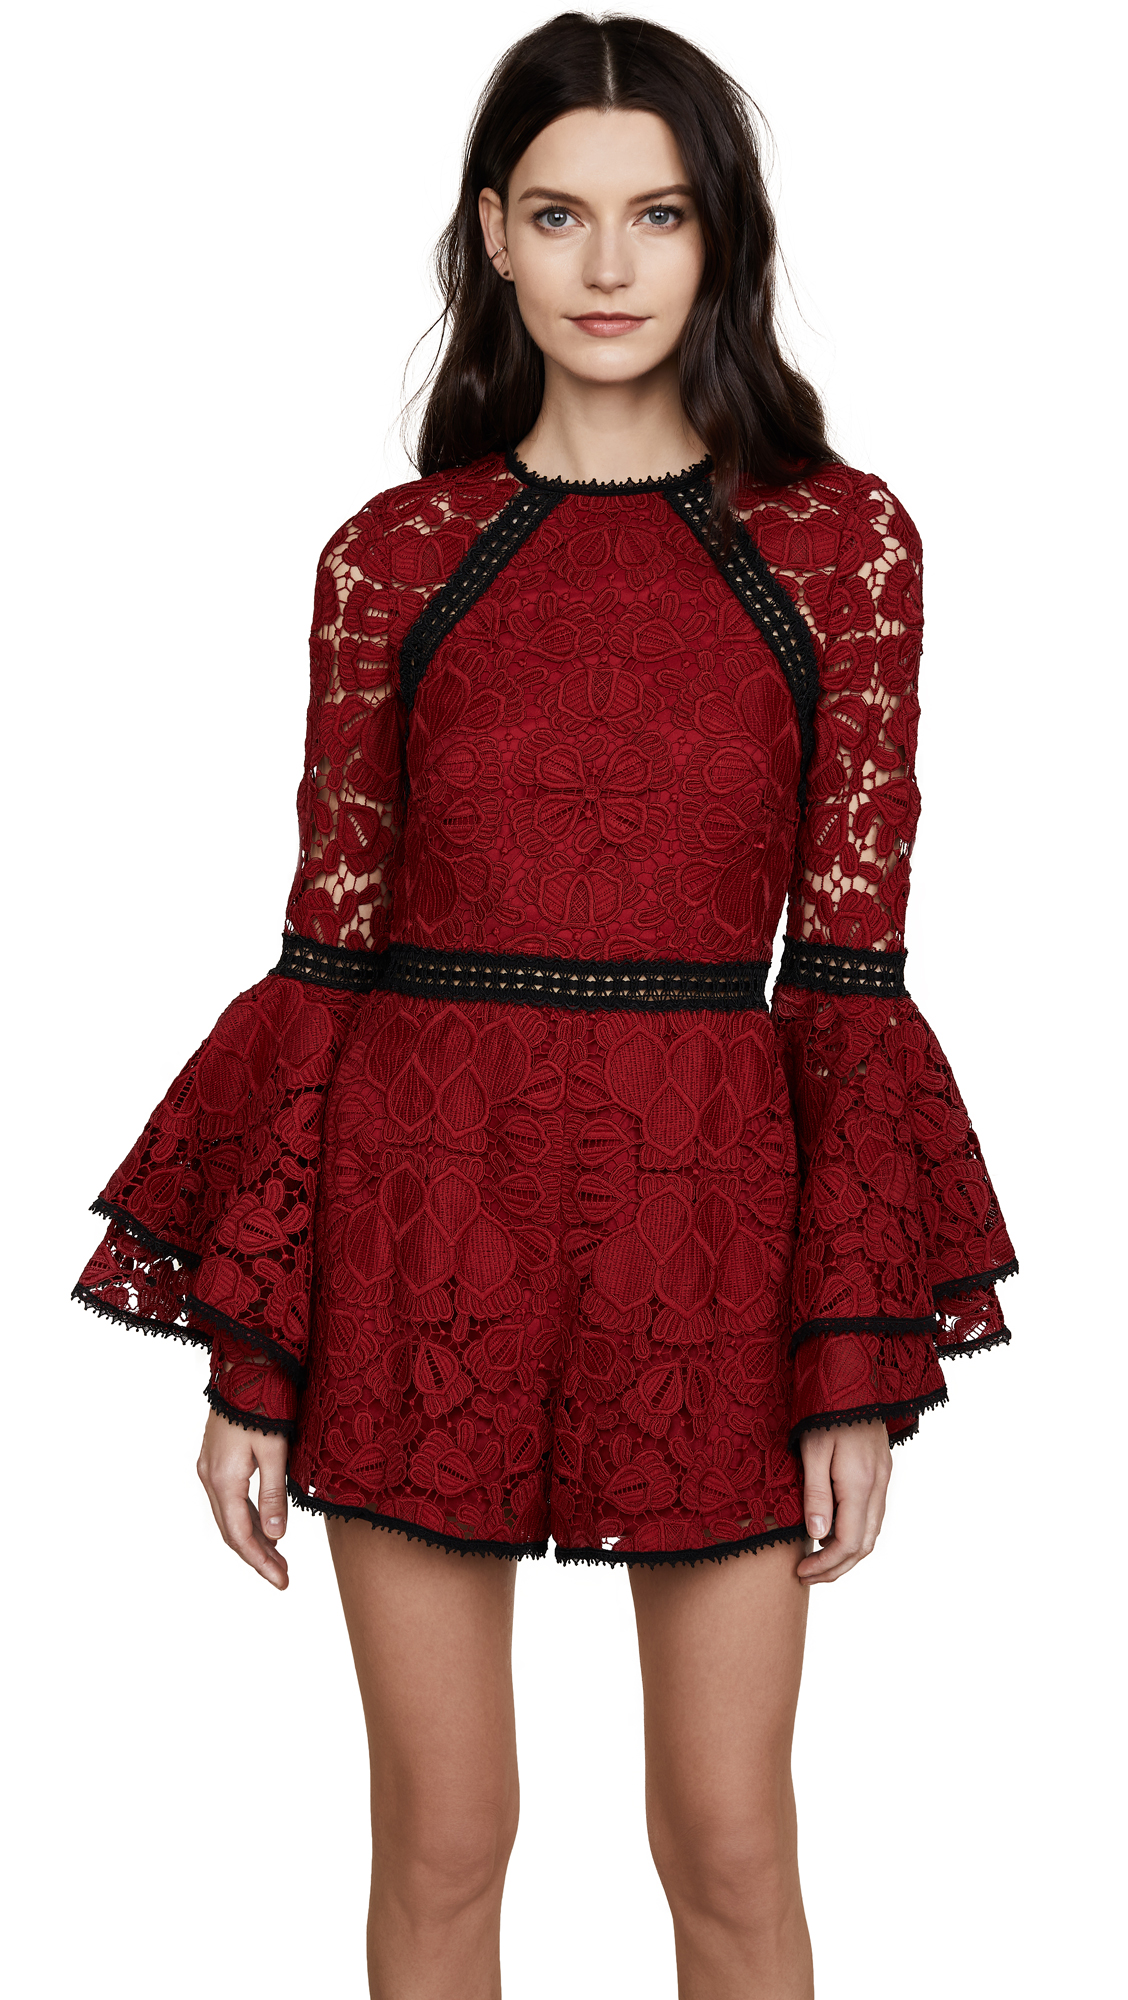 Alexis Briette Romper - Dark Red Lace